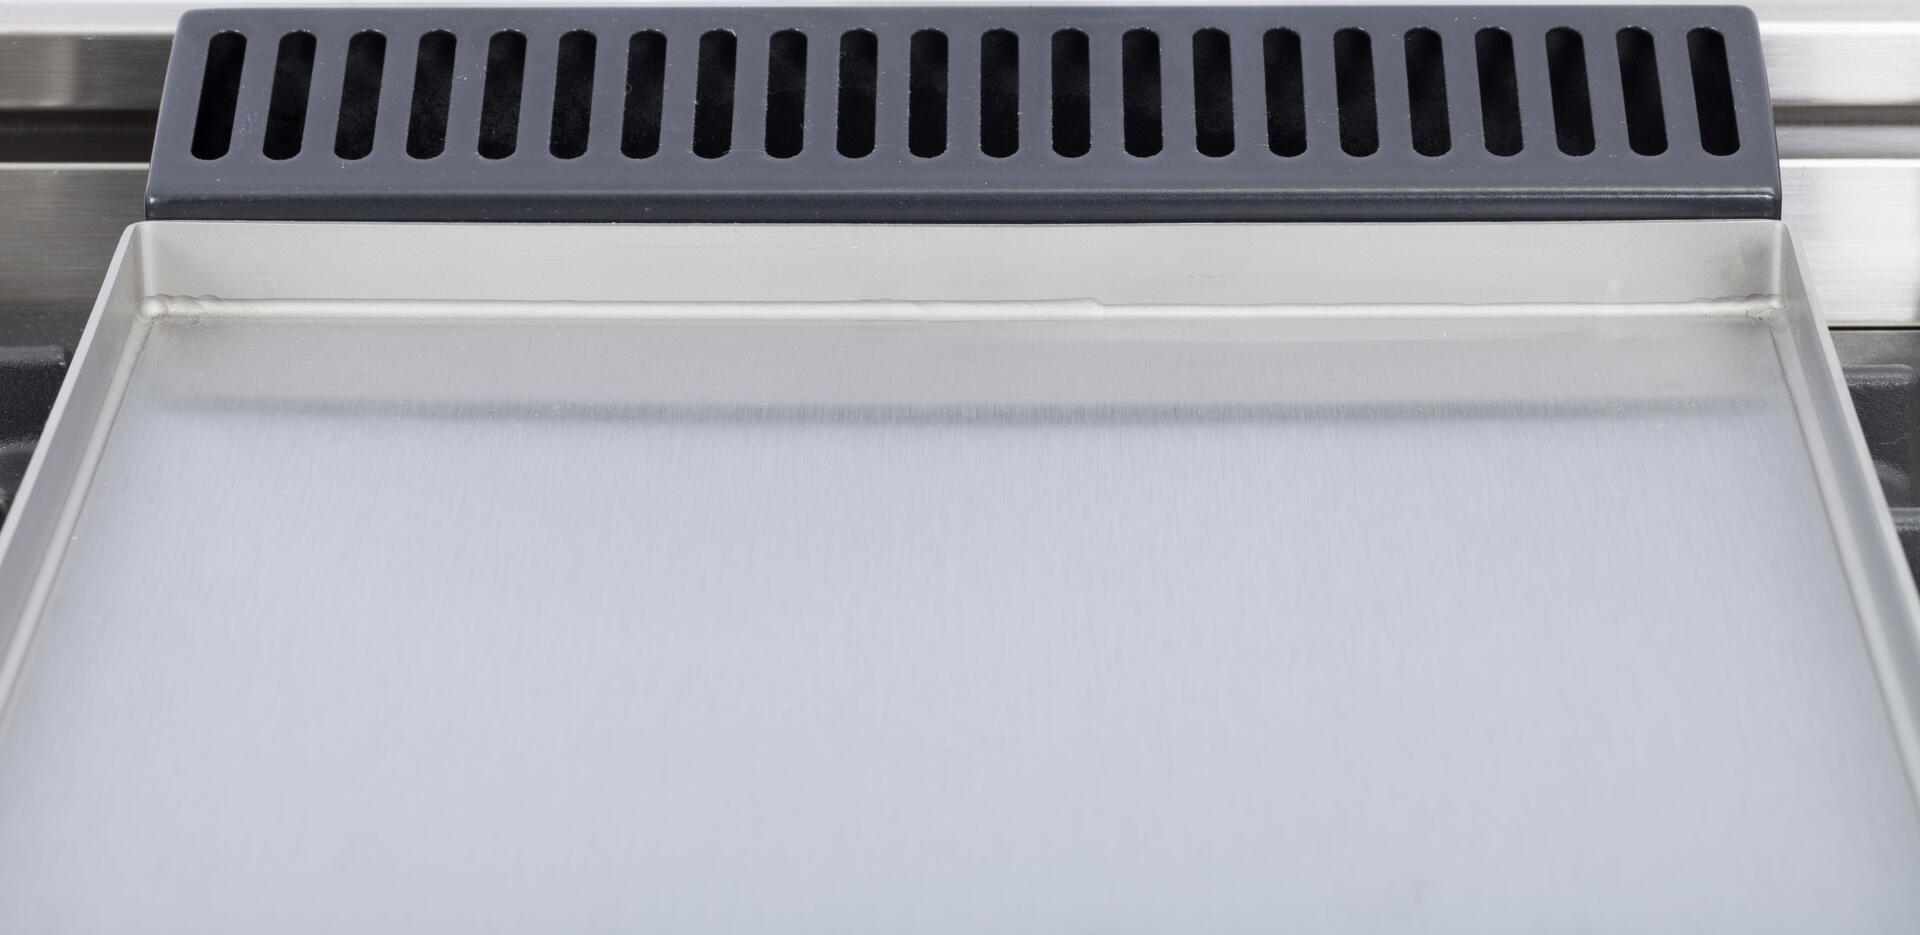 Ilve Nostalgie UPN90FDMPBL Freestanding Dual Fuel Range Blue, Griddle View